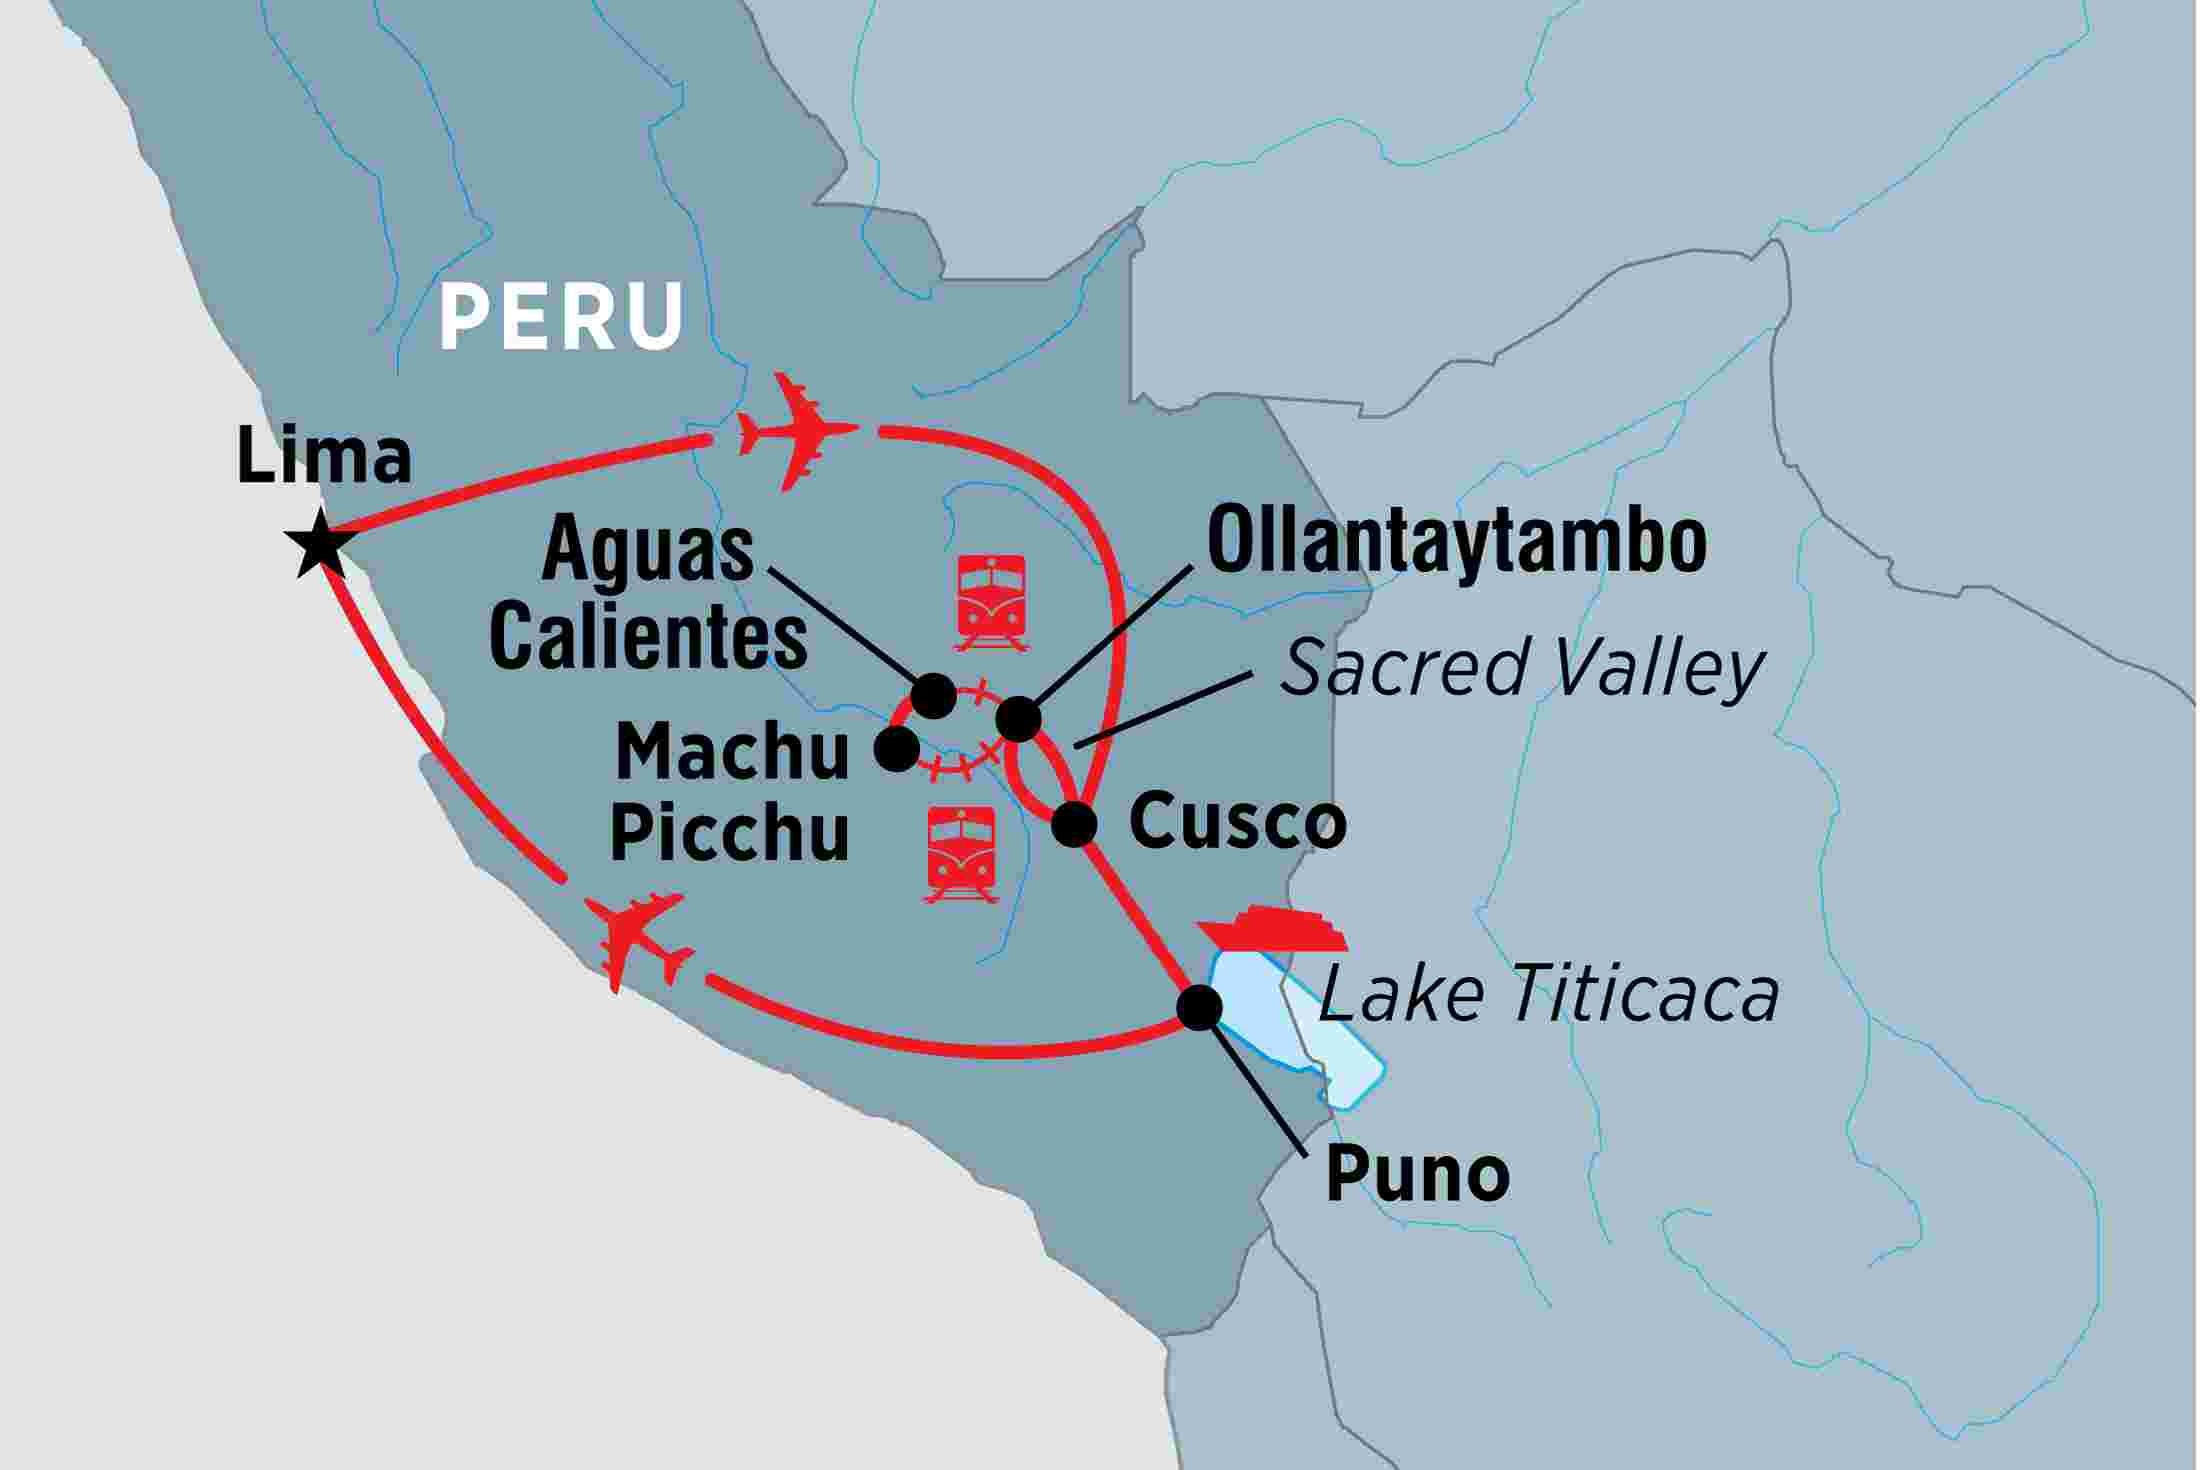 Peru Tours, Travel & Trips | Peregrine Adventures US on map of world religions today, map of inca mountains, map south america ecuador highlighted, map of the incas, about the location of inca, map of america in 1830, map of inca cities, map of ancient mayan civilization, peru inca, area ruled by inca, physical map of inca, map of inca civilization, sapa inca, aztec vs inca, map of america in 1700, map of ancient inca, atahualpa inca, apos inca, who were the inca, american inca,